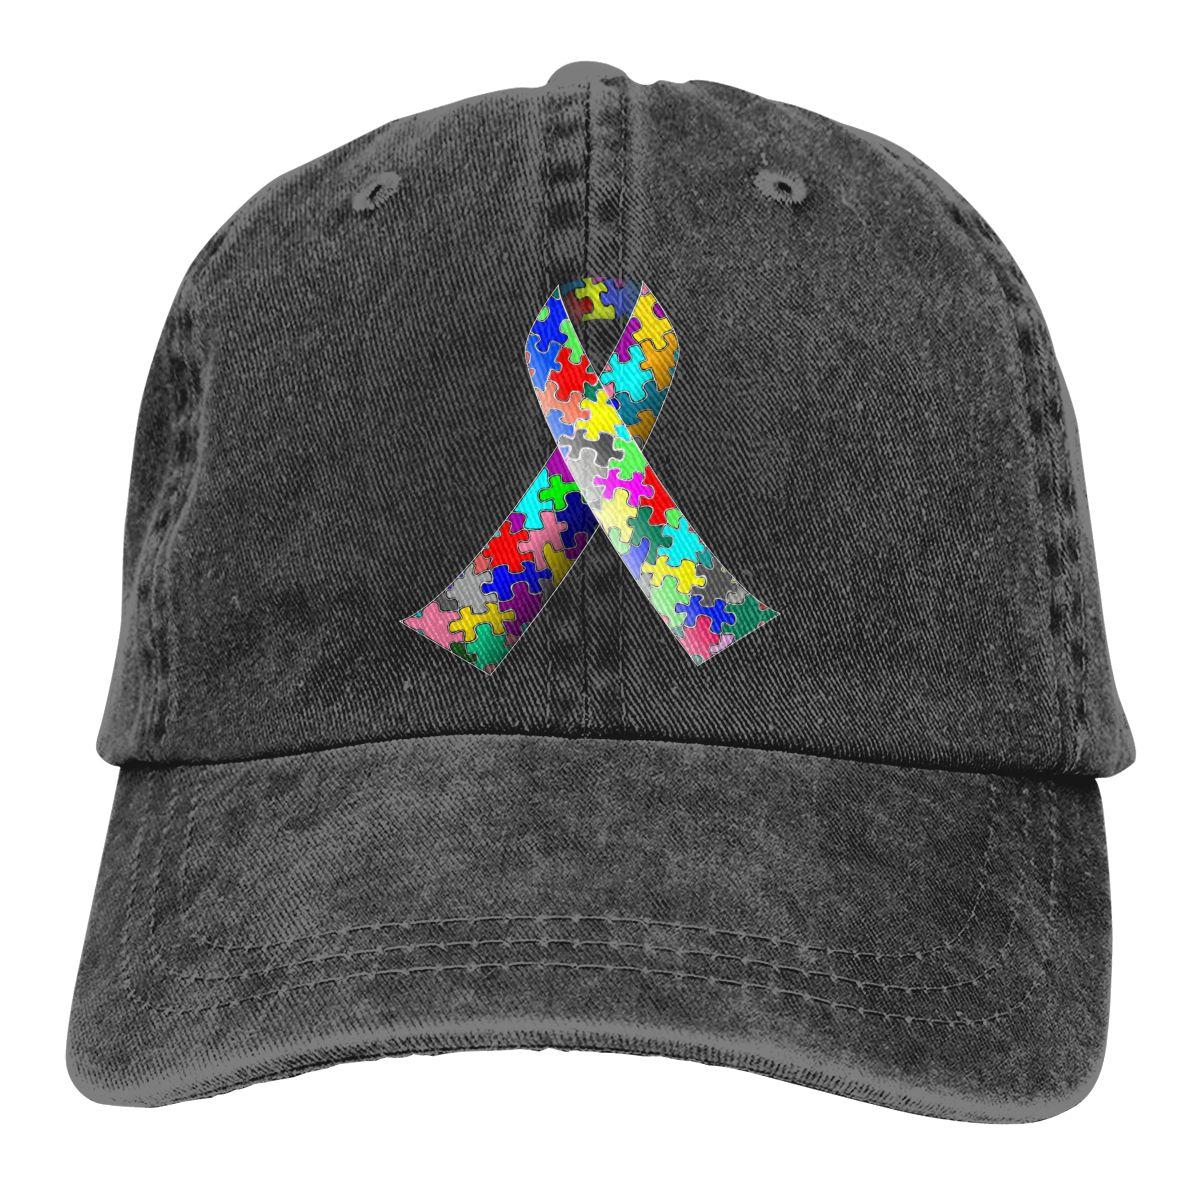 Autism Ribbon Denim Baseball Caps Unisex Outdoor Recreation Autism Ribbon Bill Caps Fashion Active Dome Hats